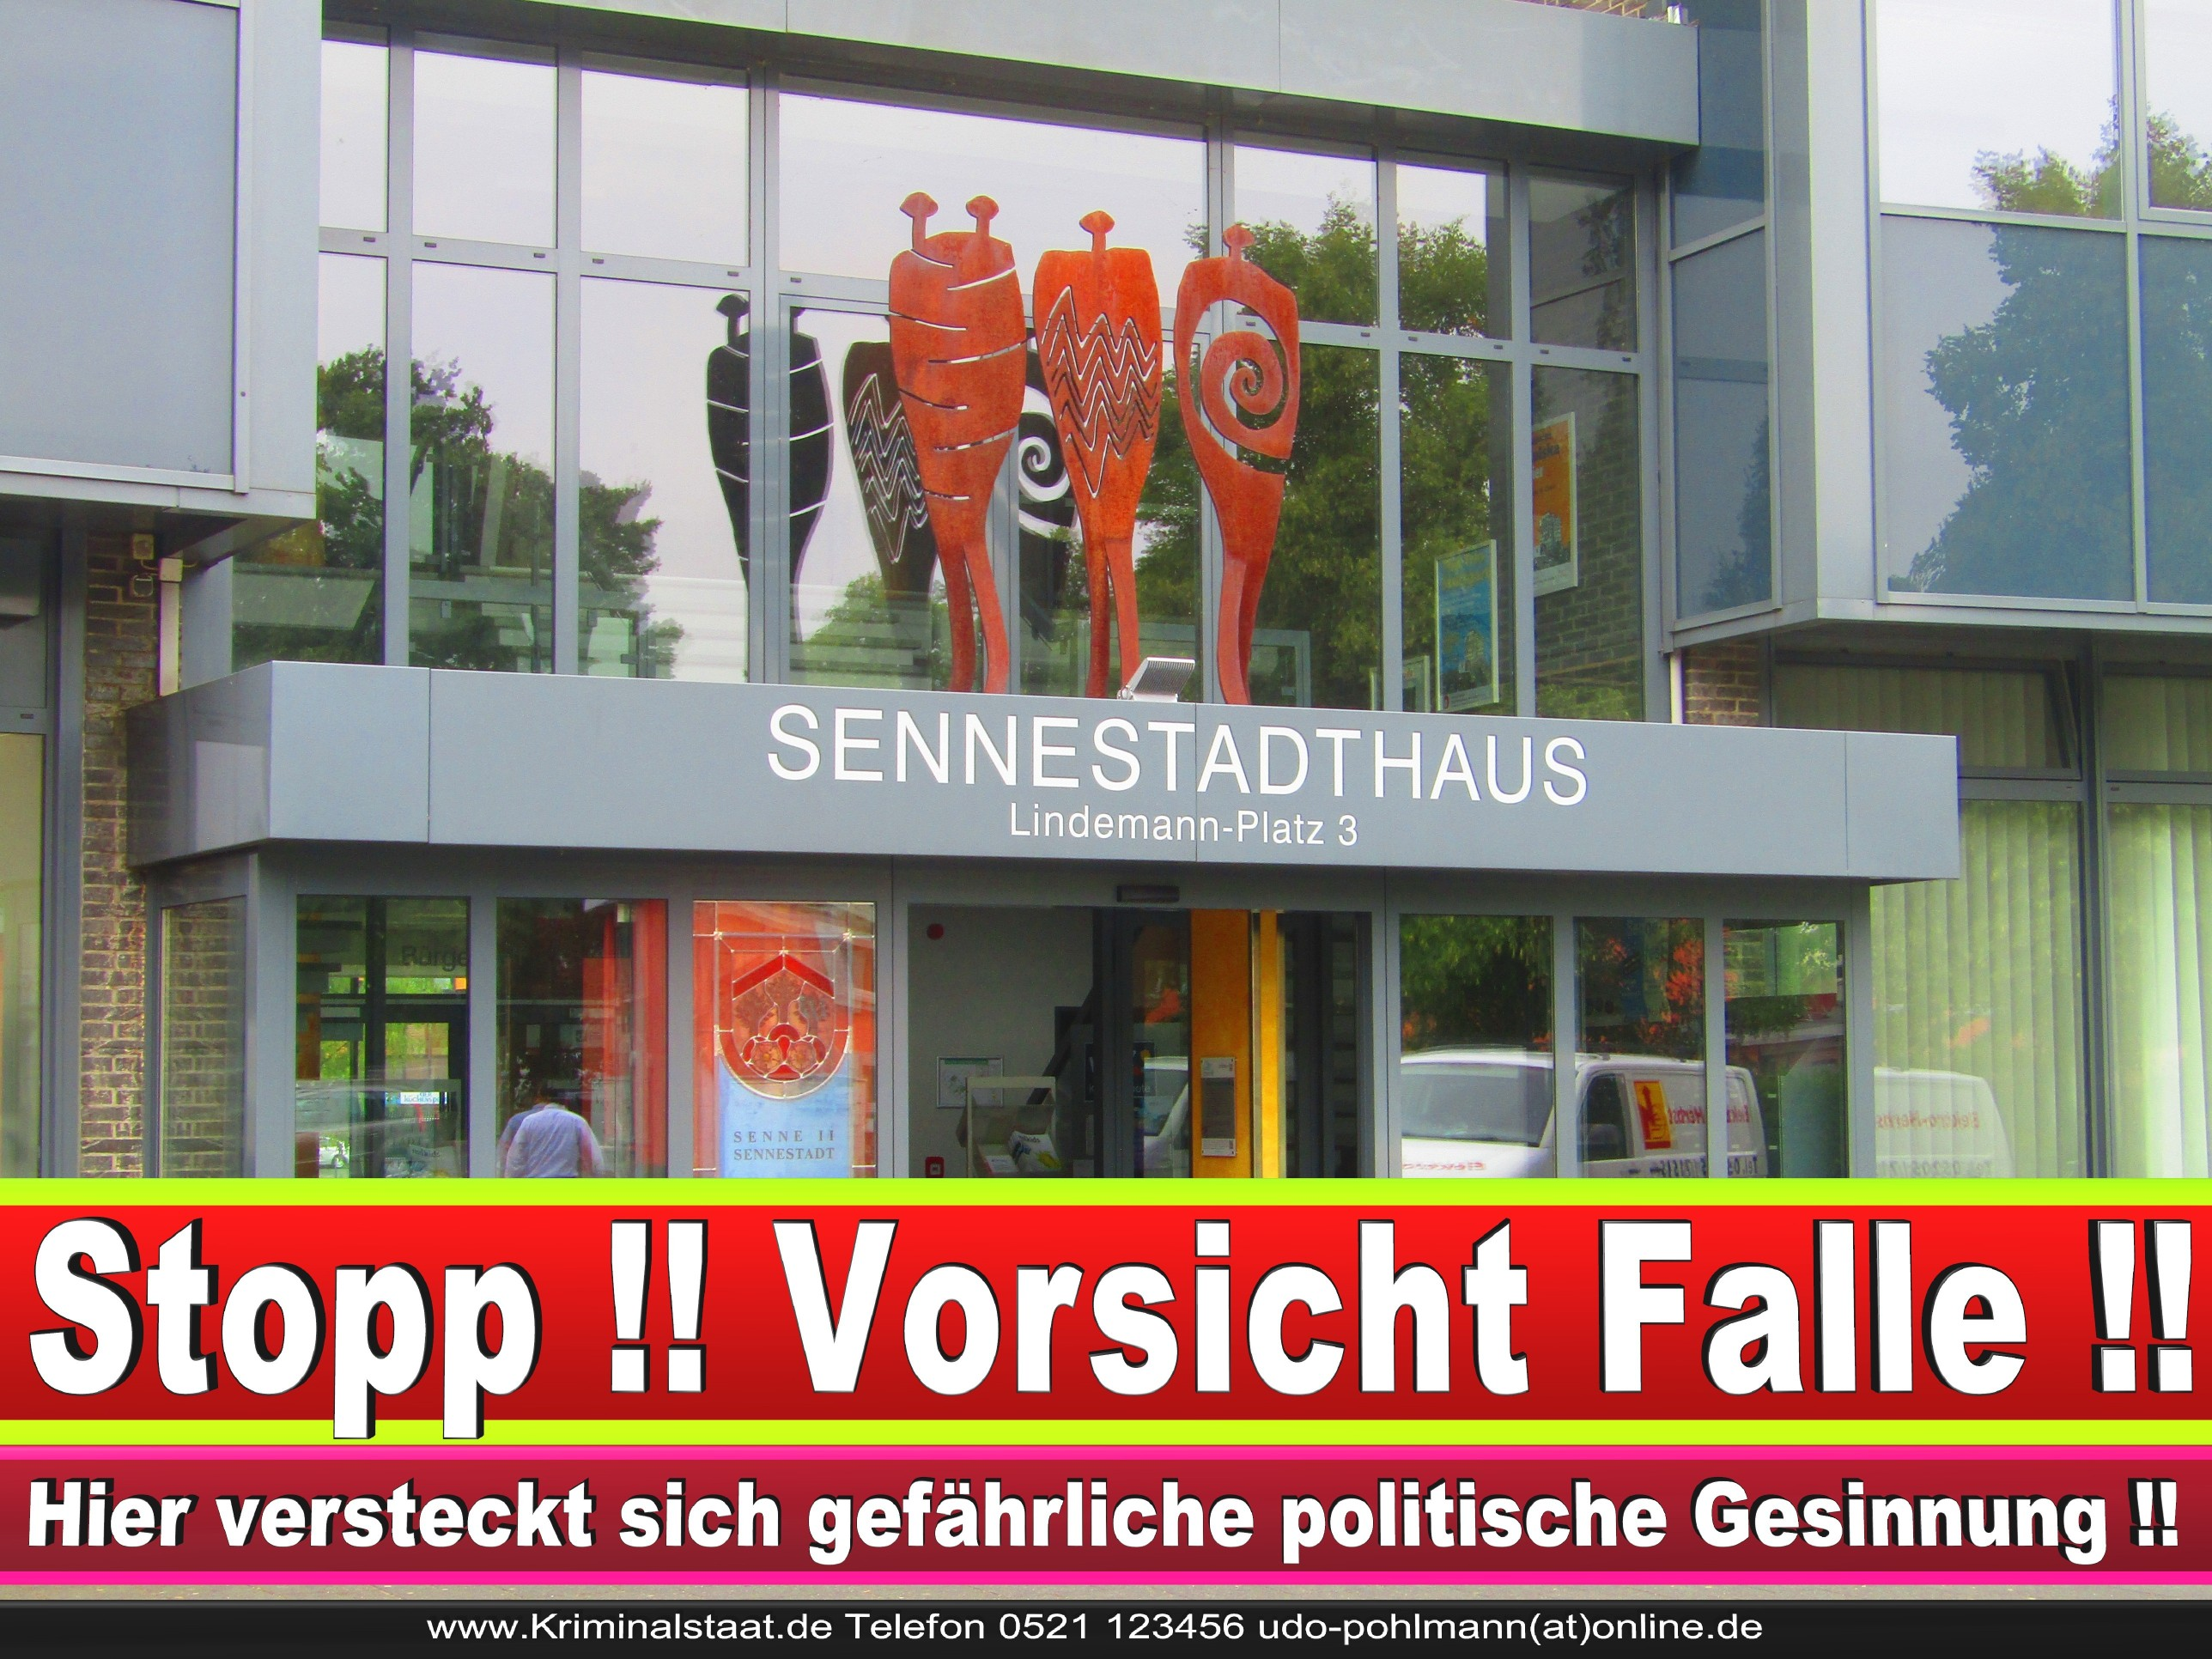 SENNESTADTVEREIN CDU BIELEFELD 3 LANDTAGSWAHL BUNDESTAGSWAHL BÜRGERMEISTERWAHL